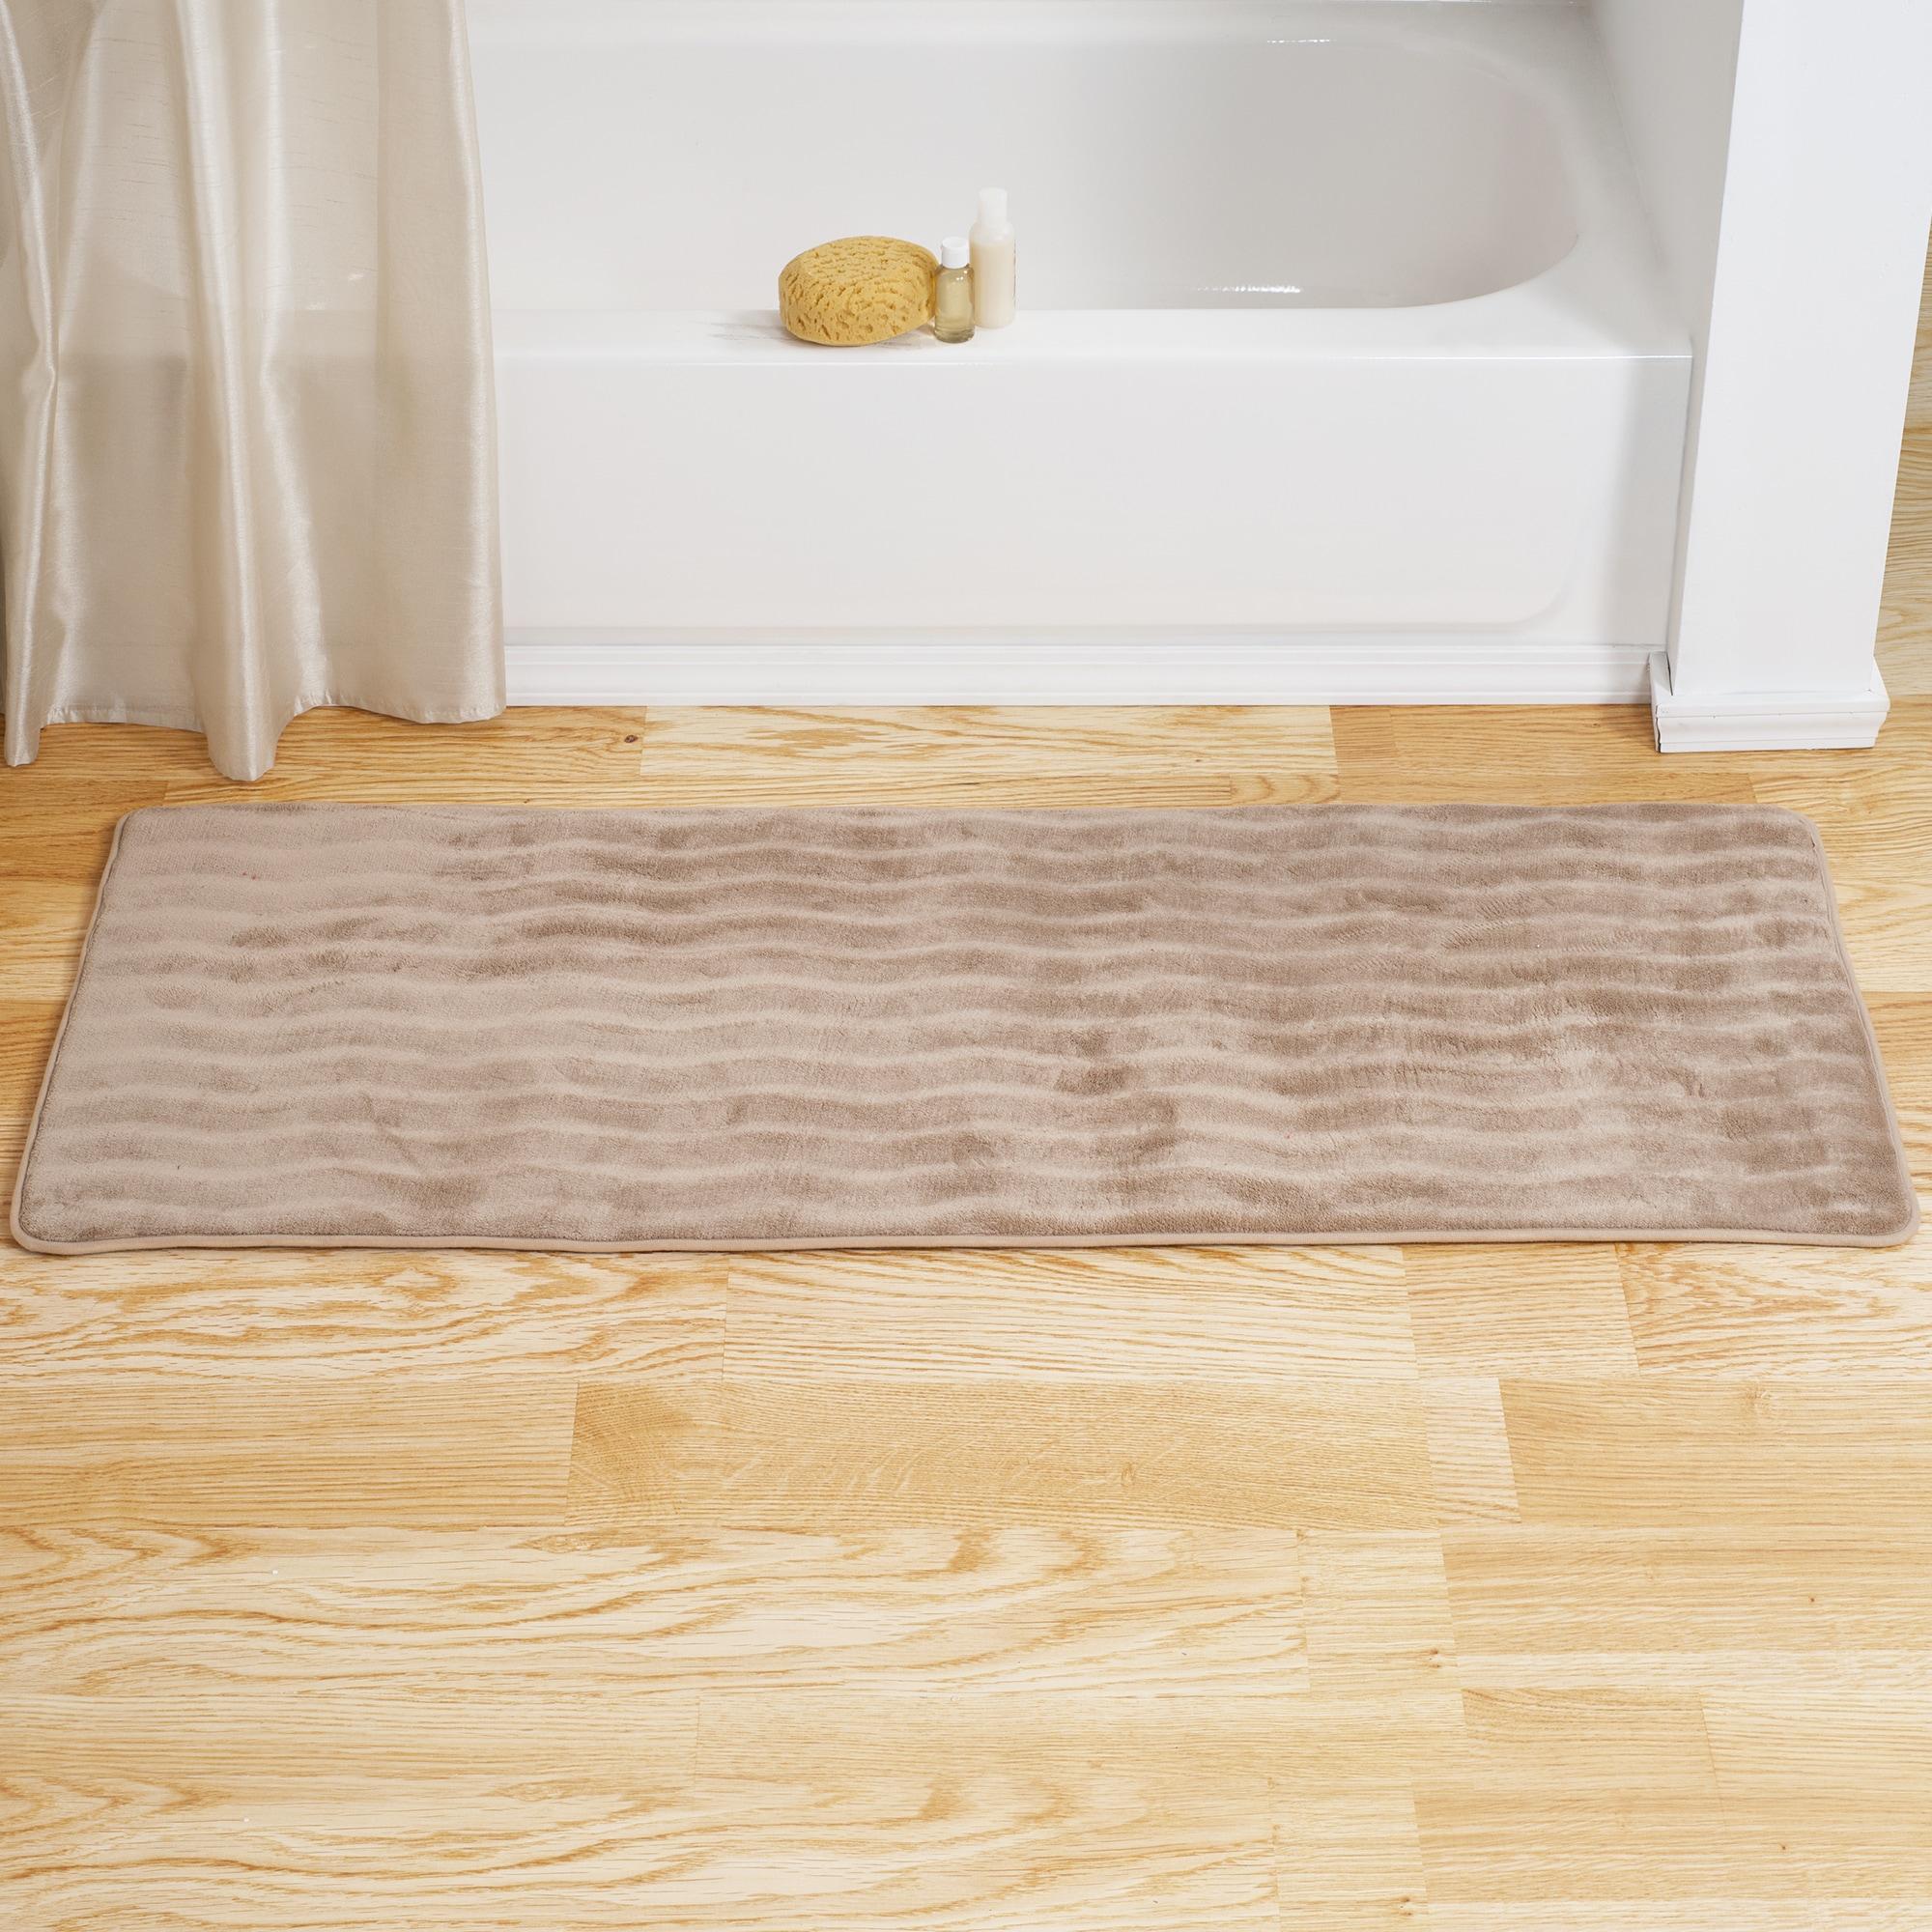 Trademark Windsor Home Memory Foam Extra Long Bath Rug Ma...